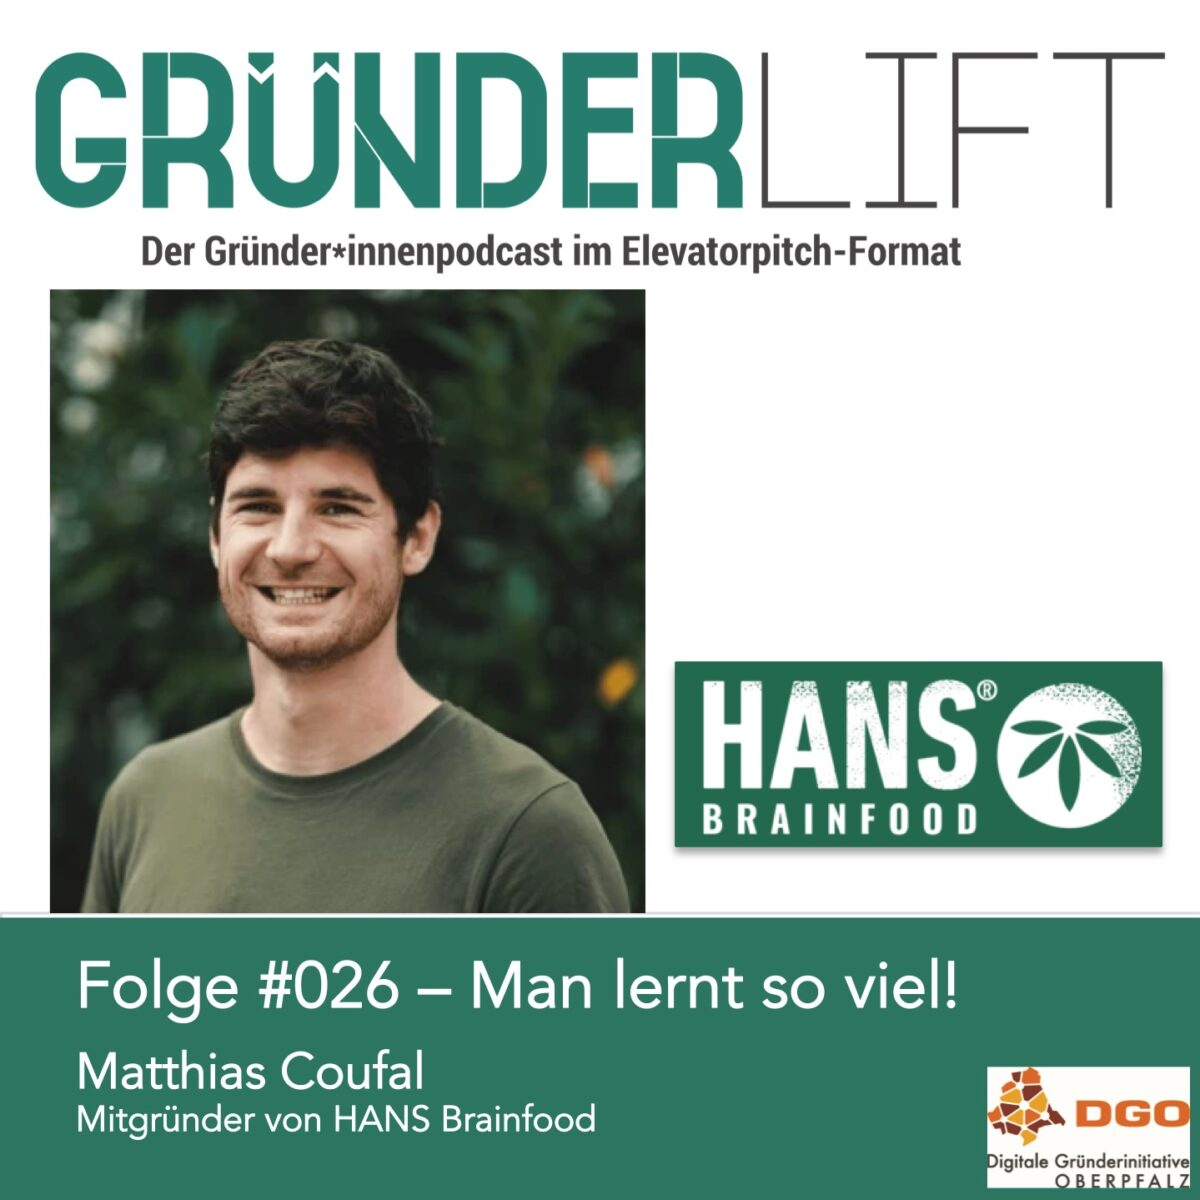 Gründerlift Folge #026 Matthias Coufal HANS Brainfood